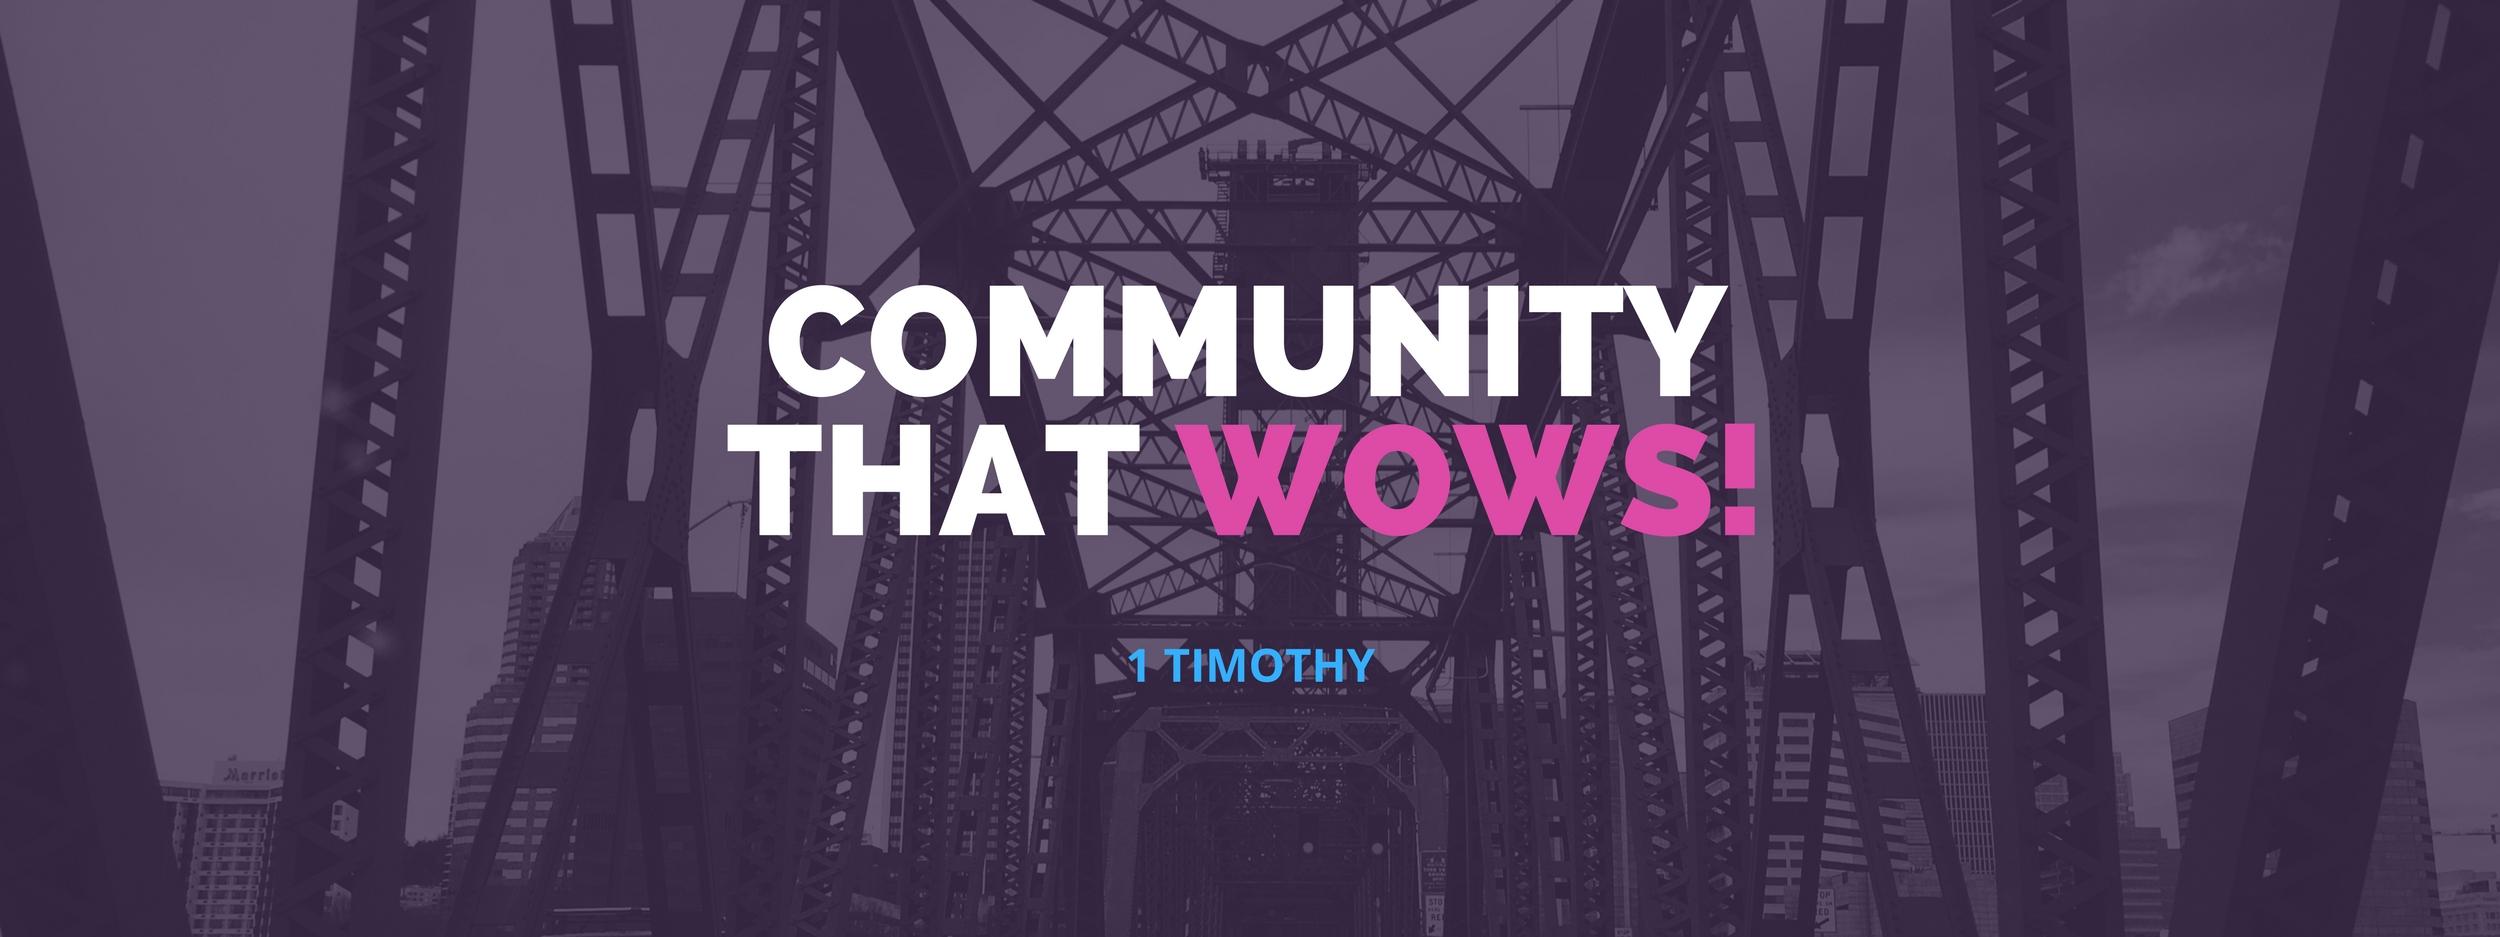 community WOWS 1 Timothy bridge background.jpg